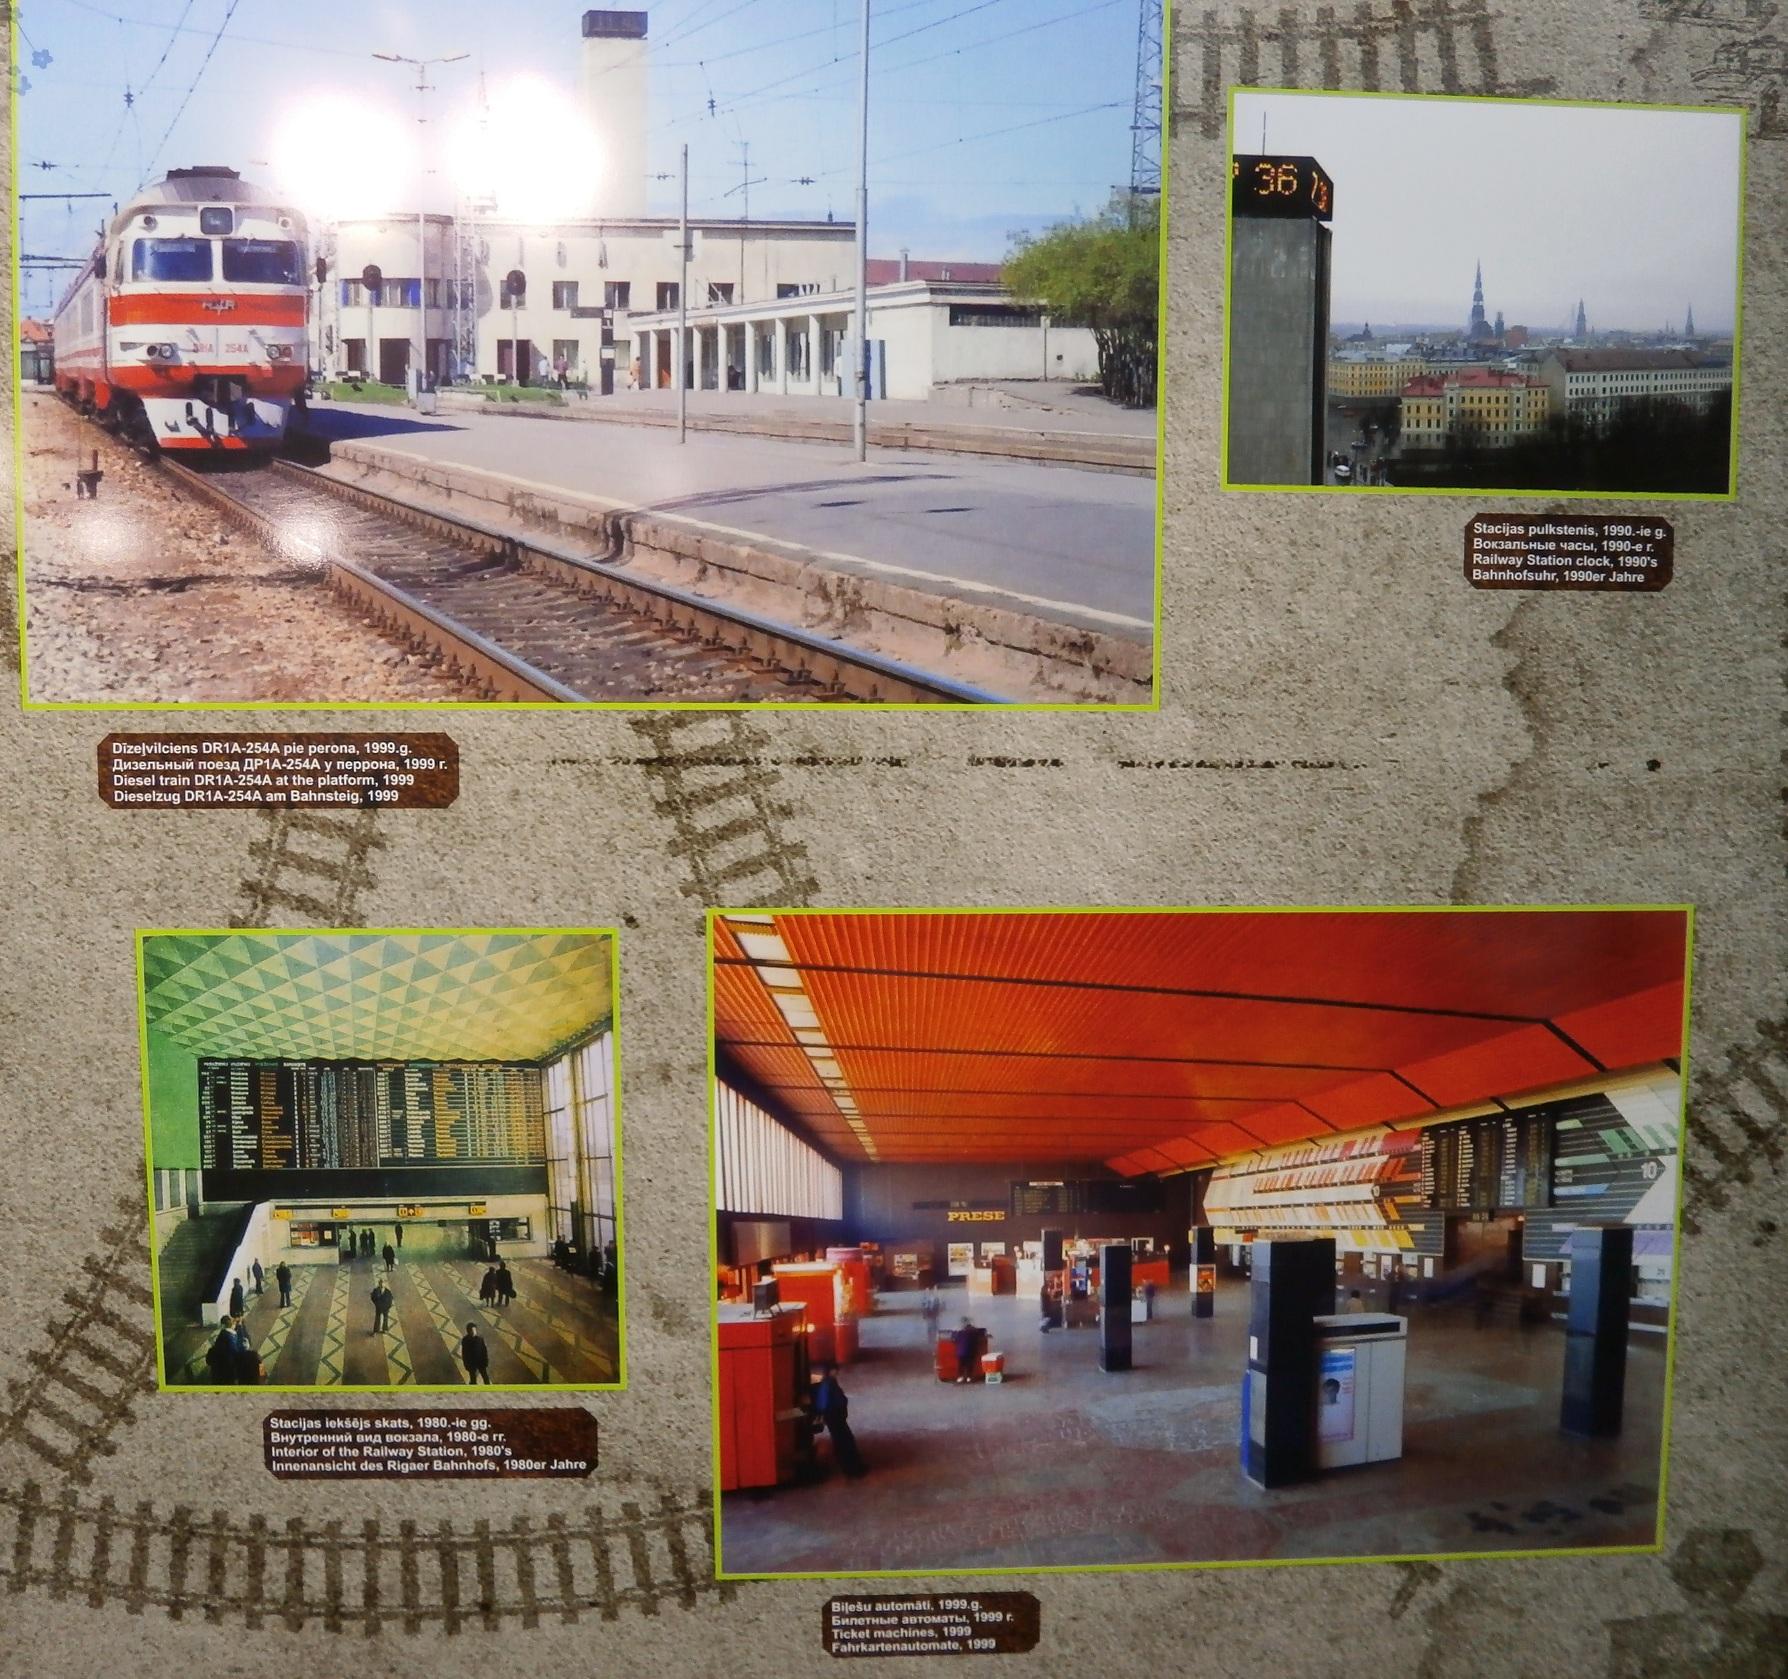 1986-P1240058